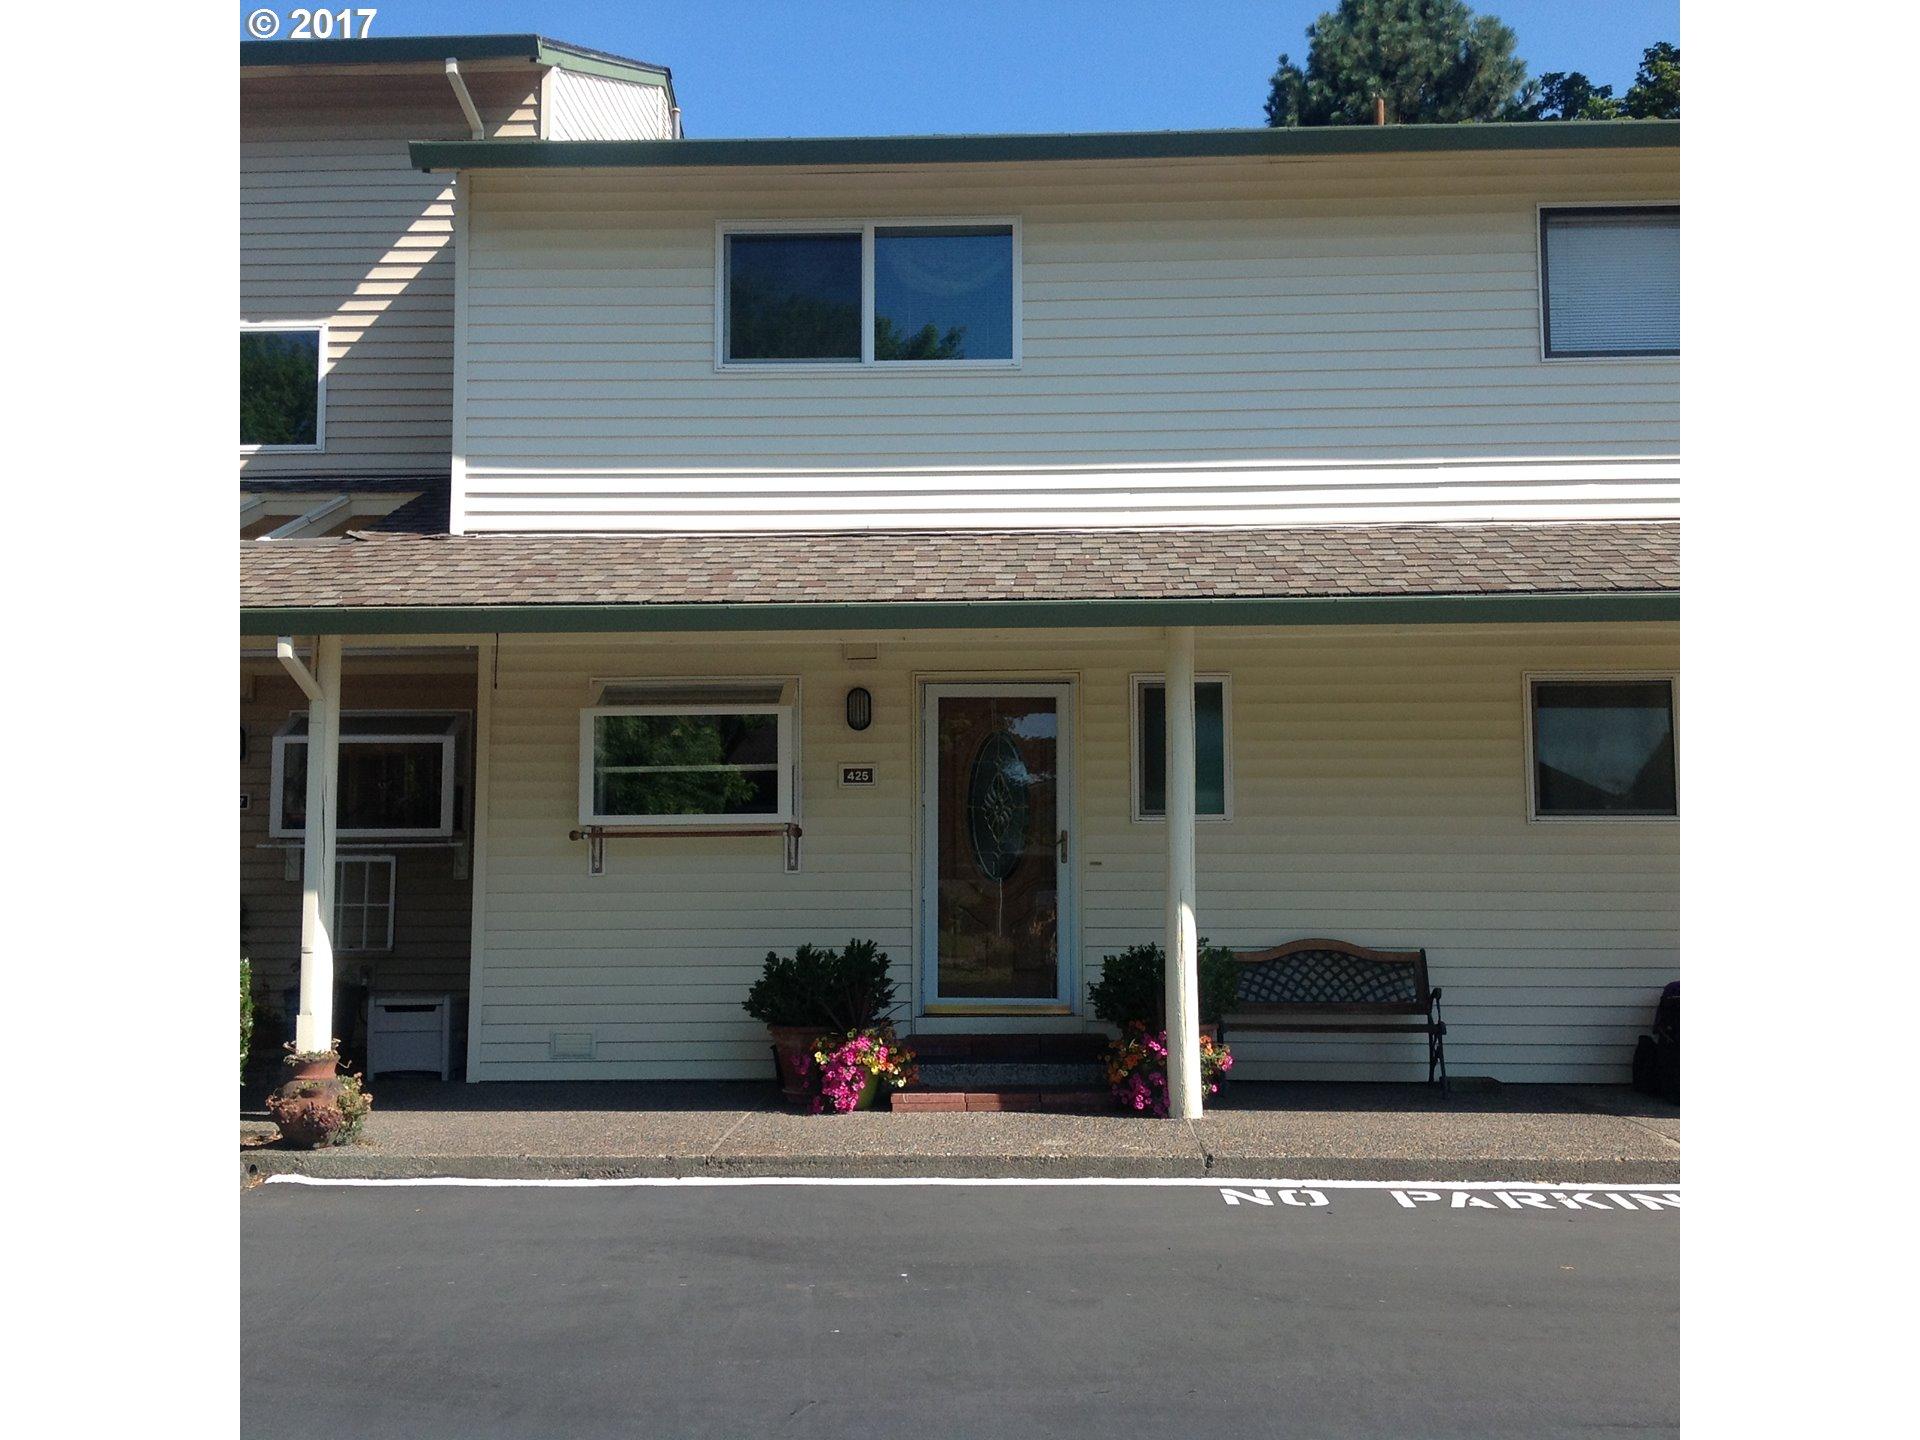 425 N HAYDEN BAY DR, Portland, OR 97217